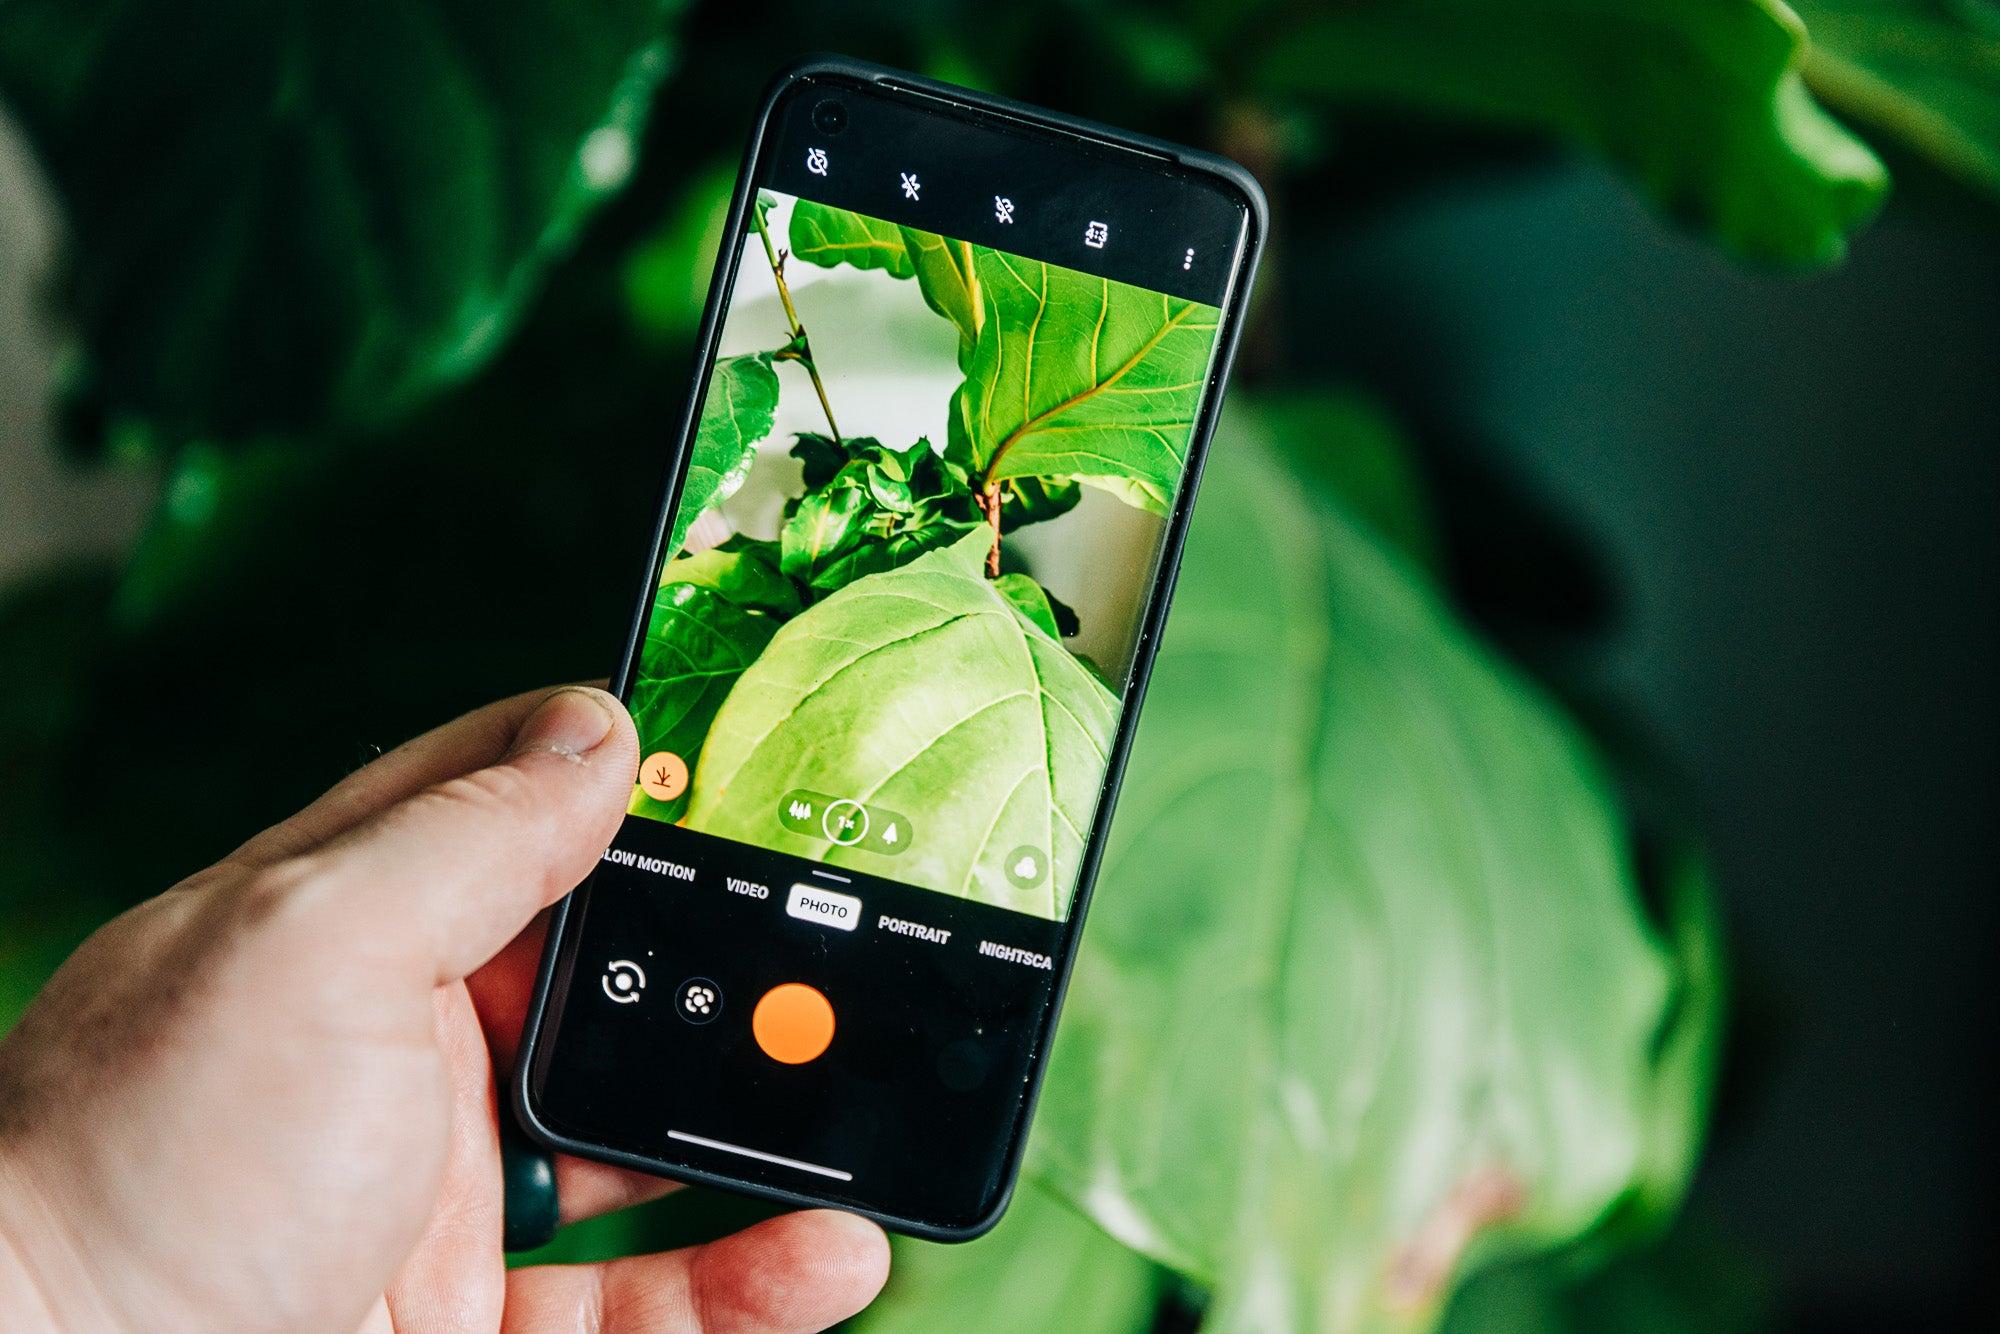 OnePlus 9 Pro camera app